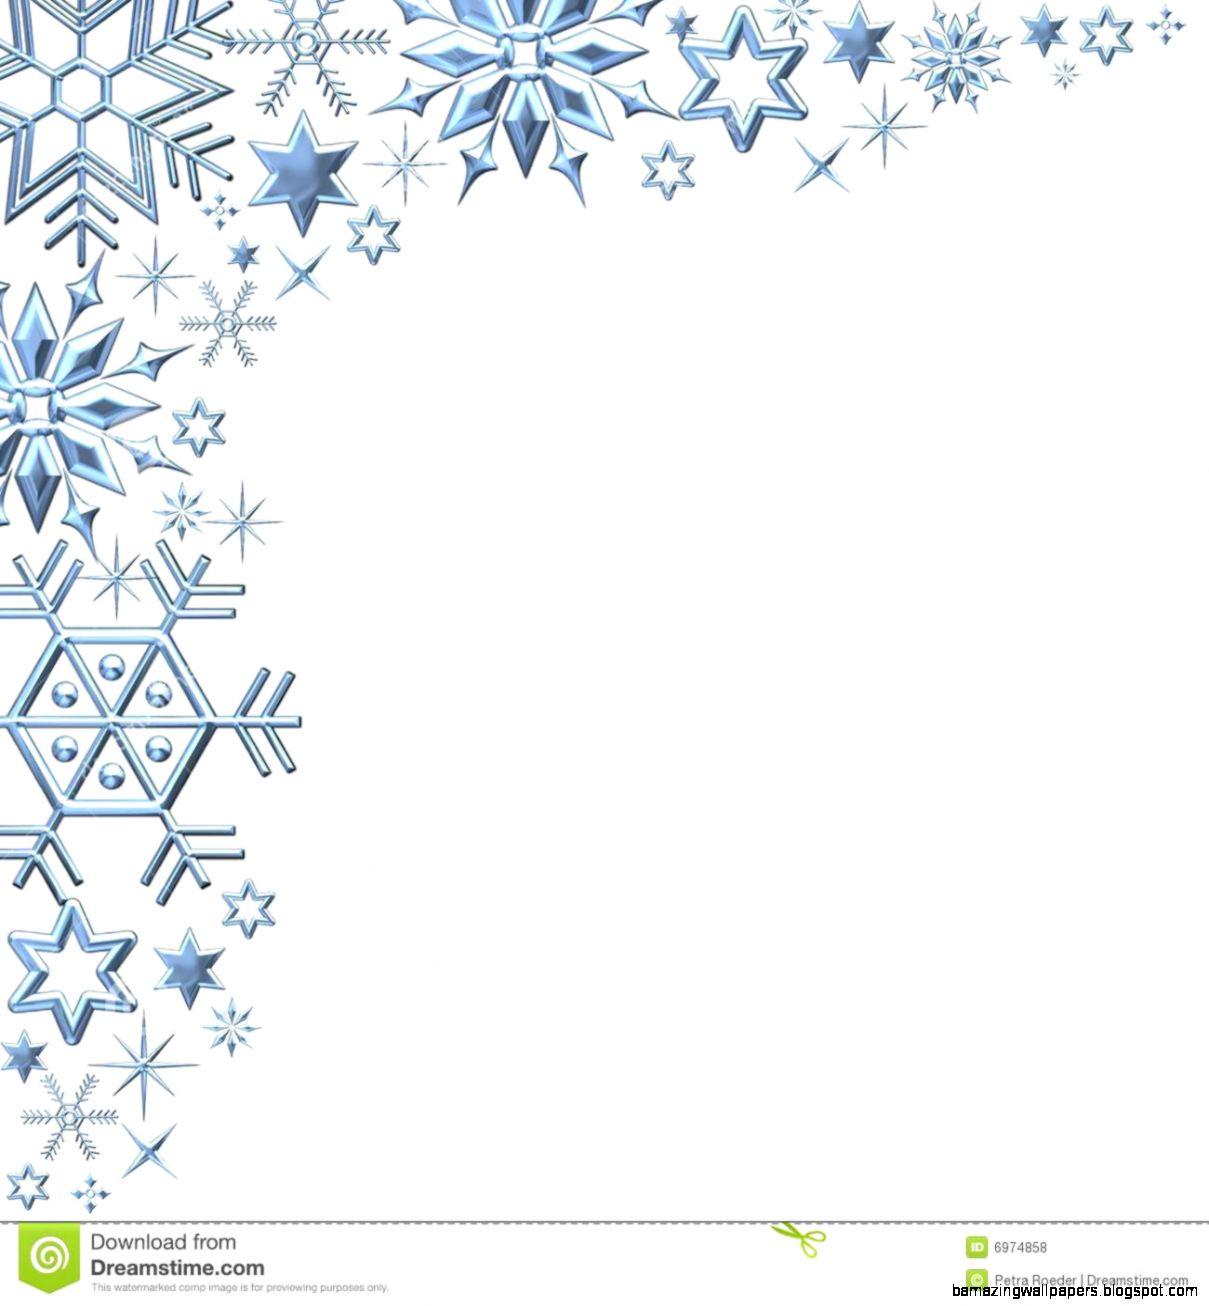 Printable Winter Border Clipart